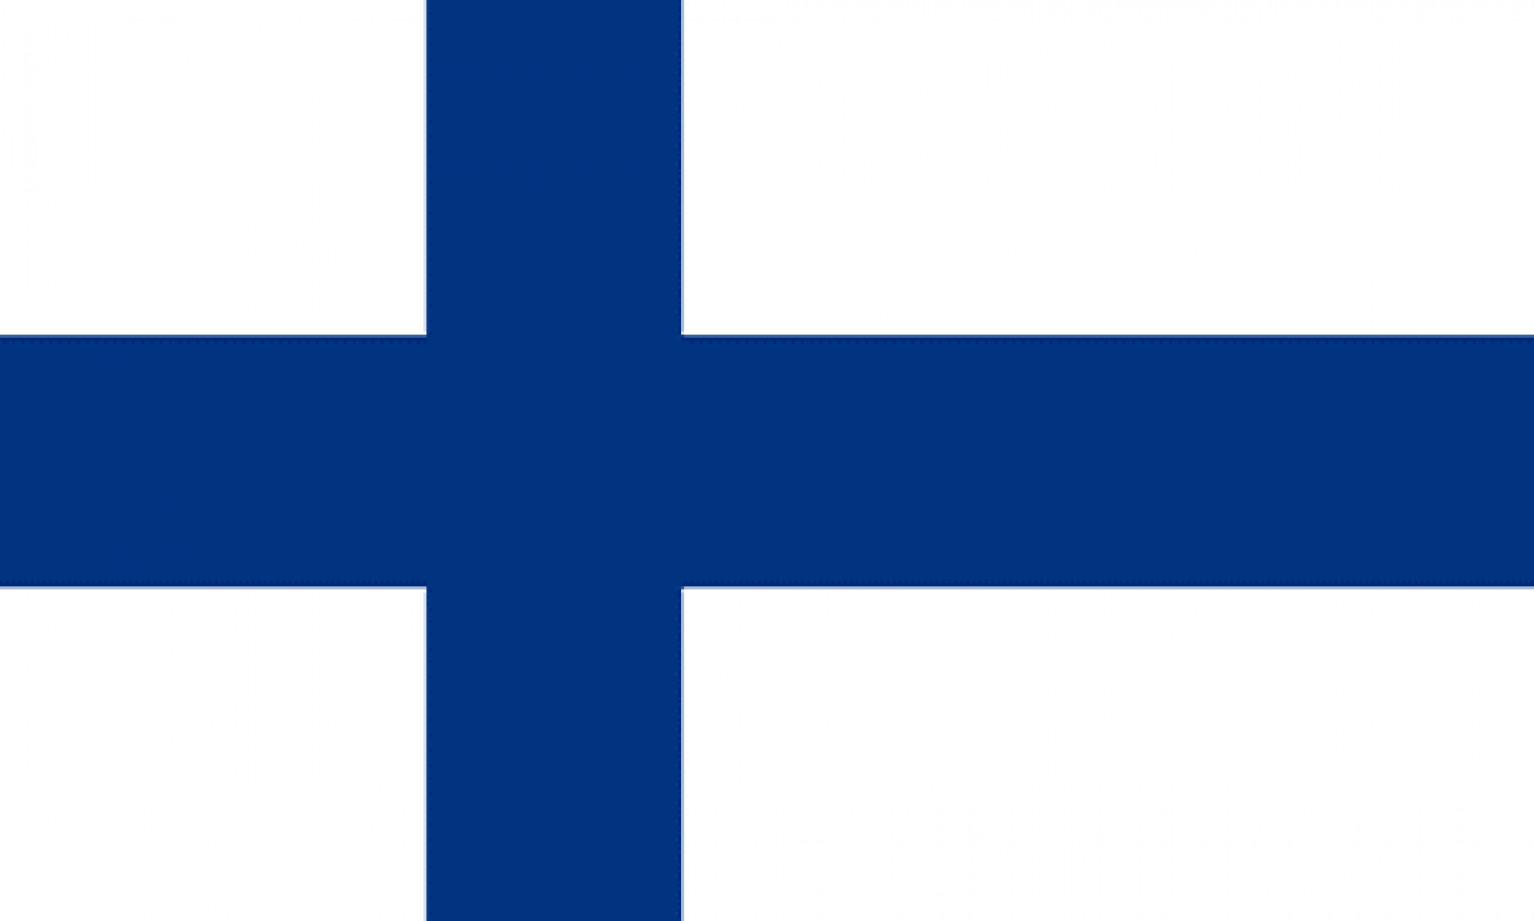 Finnish Peer-to-Peer lending platforms and market